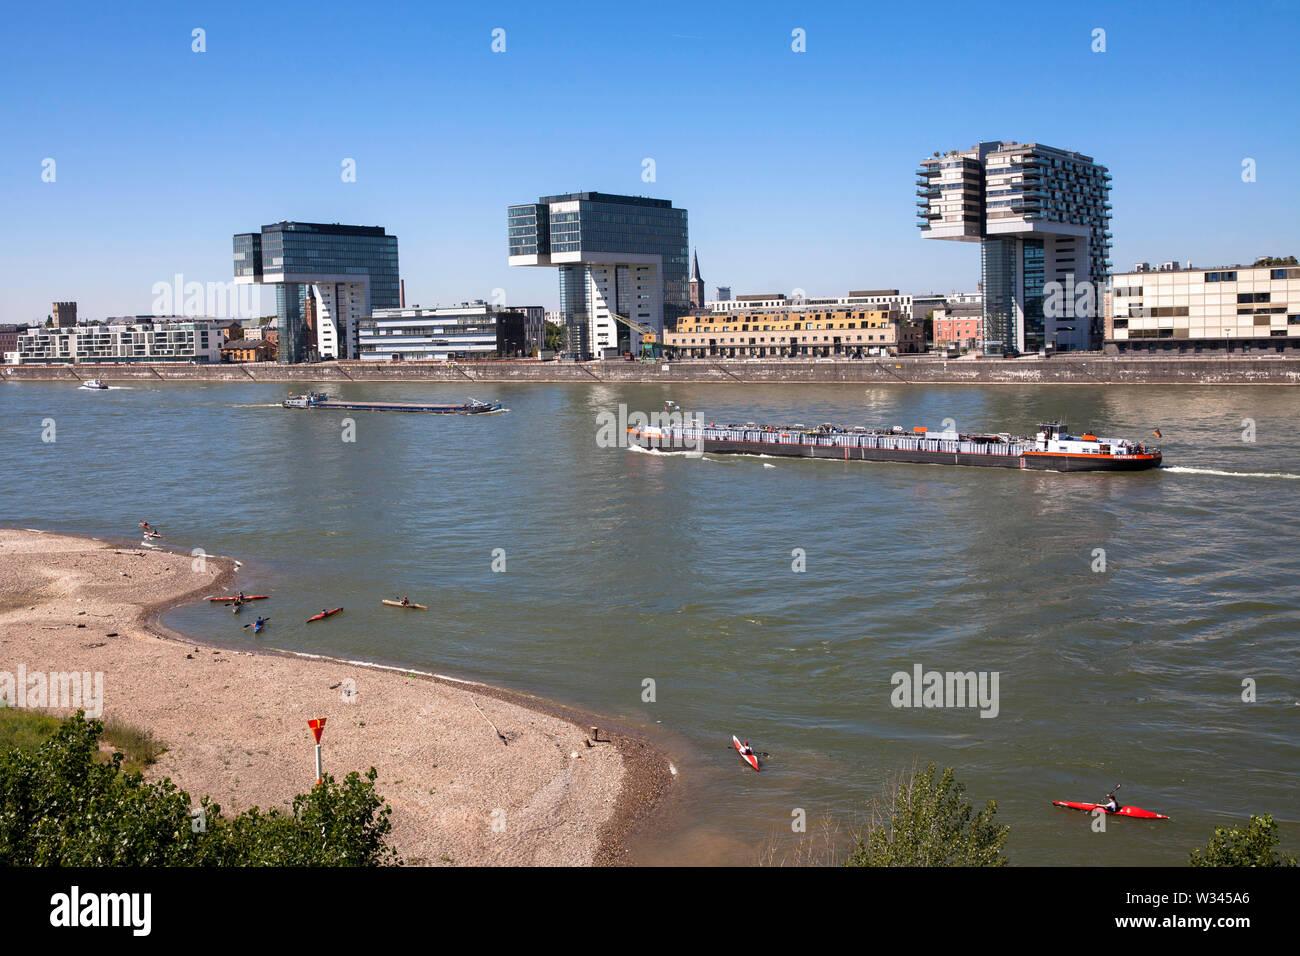 the Crane Houses at the Rheinau harbour, architect Hadi Teherani, river Rhine, Cologne, Germany.  die drei Kranhaeuser im Rheinauhafen, Architekt Hadi - Stock Image